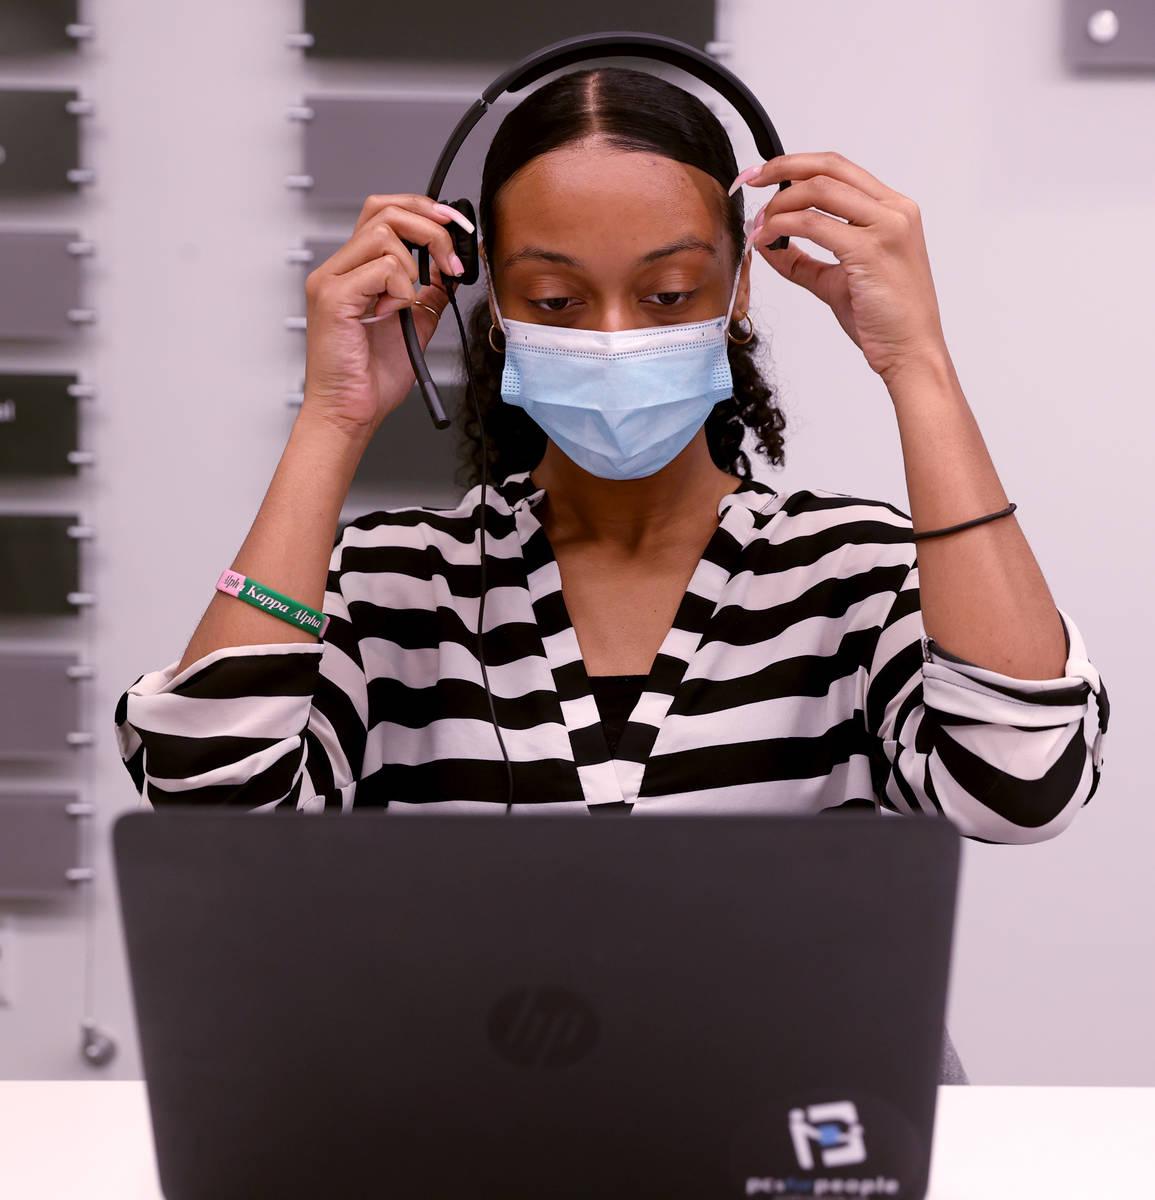 UNLV School of Public Health student Alanna Johnson works on COVID-19 contract tracing Thursday ...